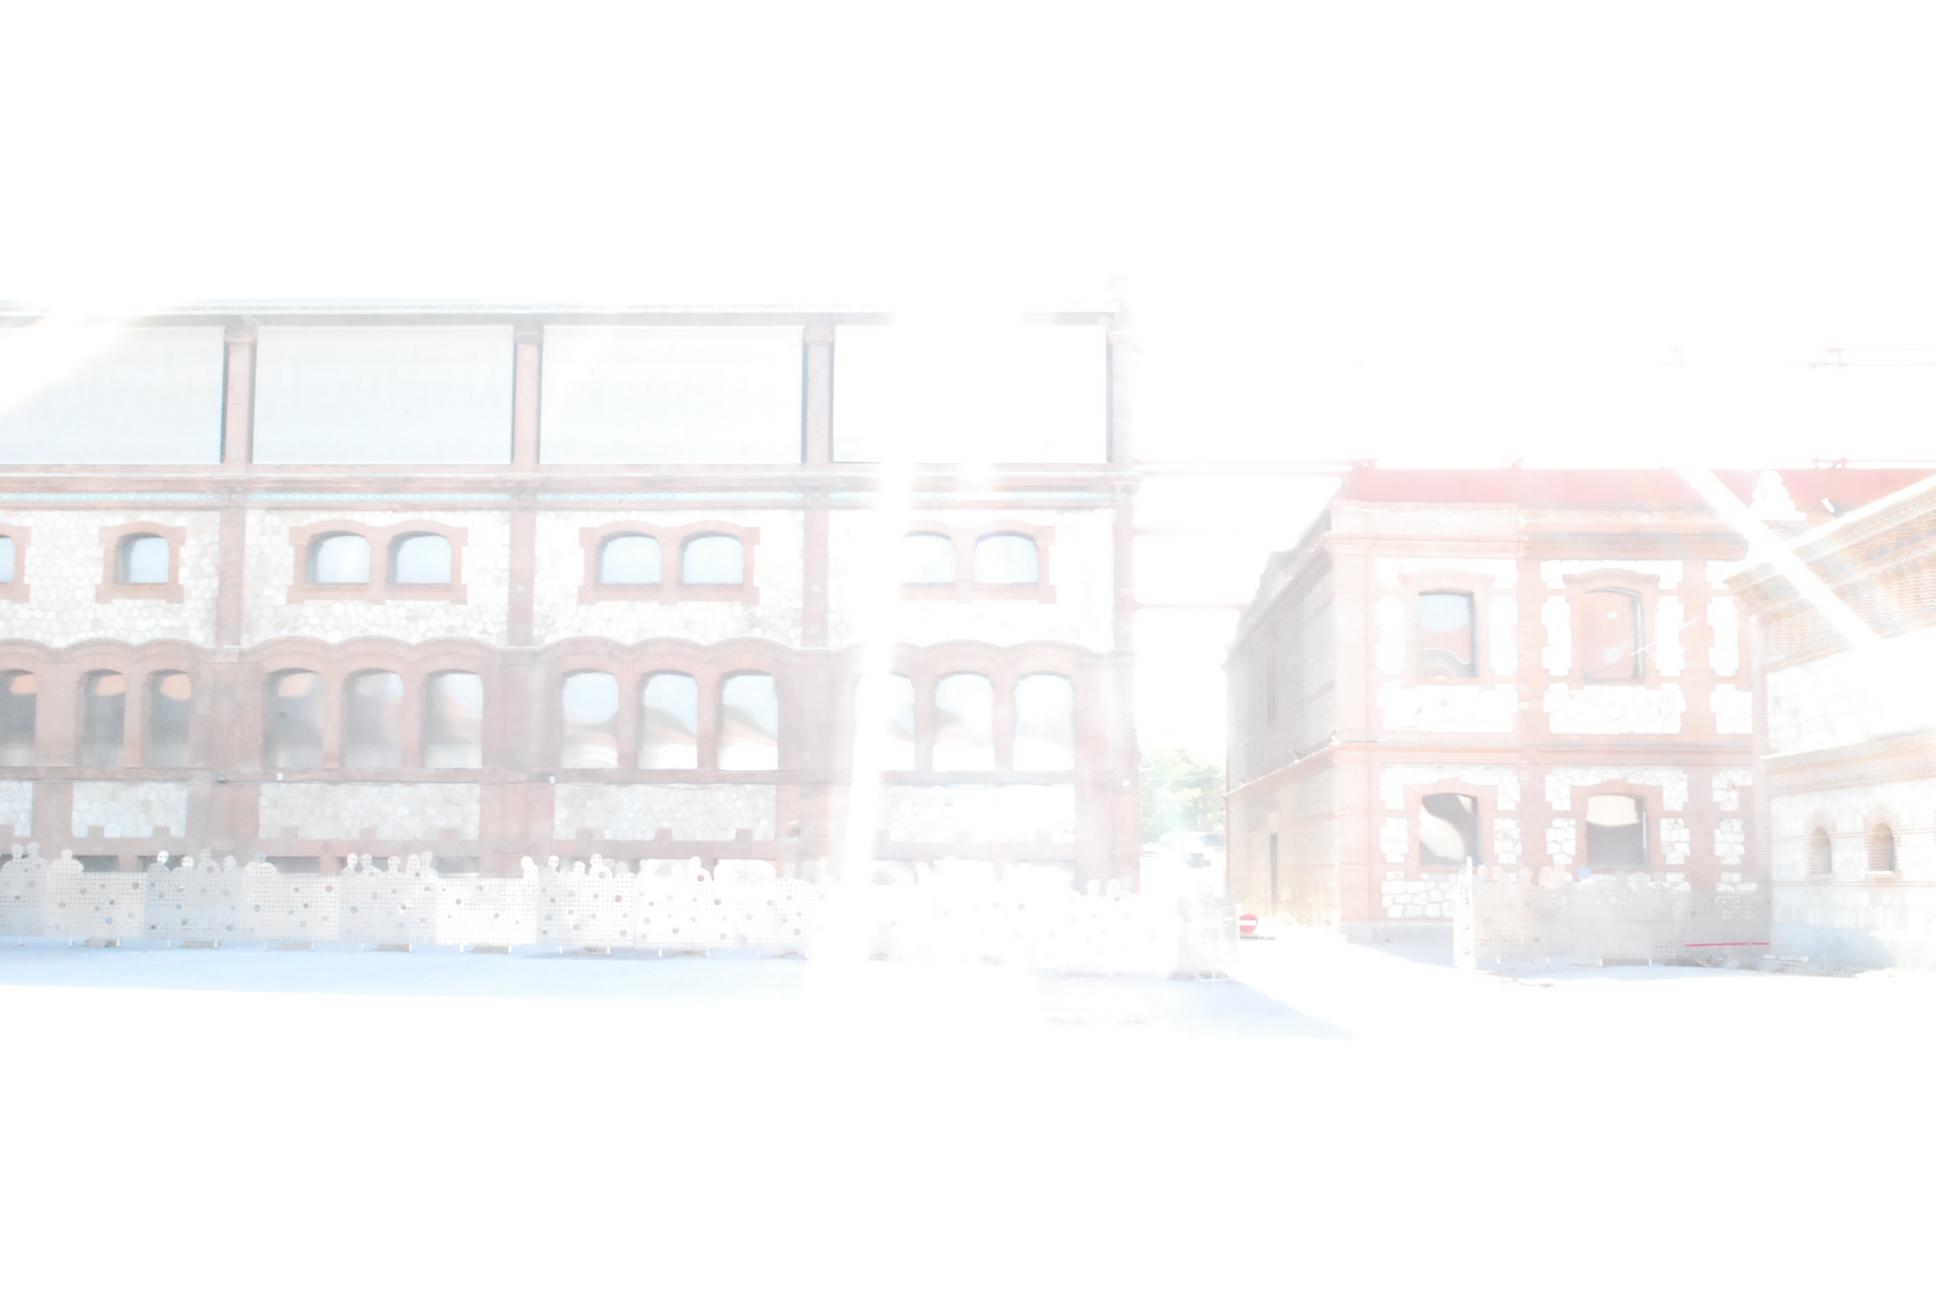 img/Original environment pictures/DSC_8035.JPG